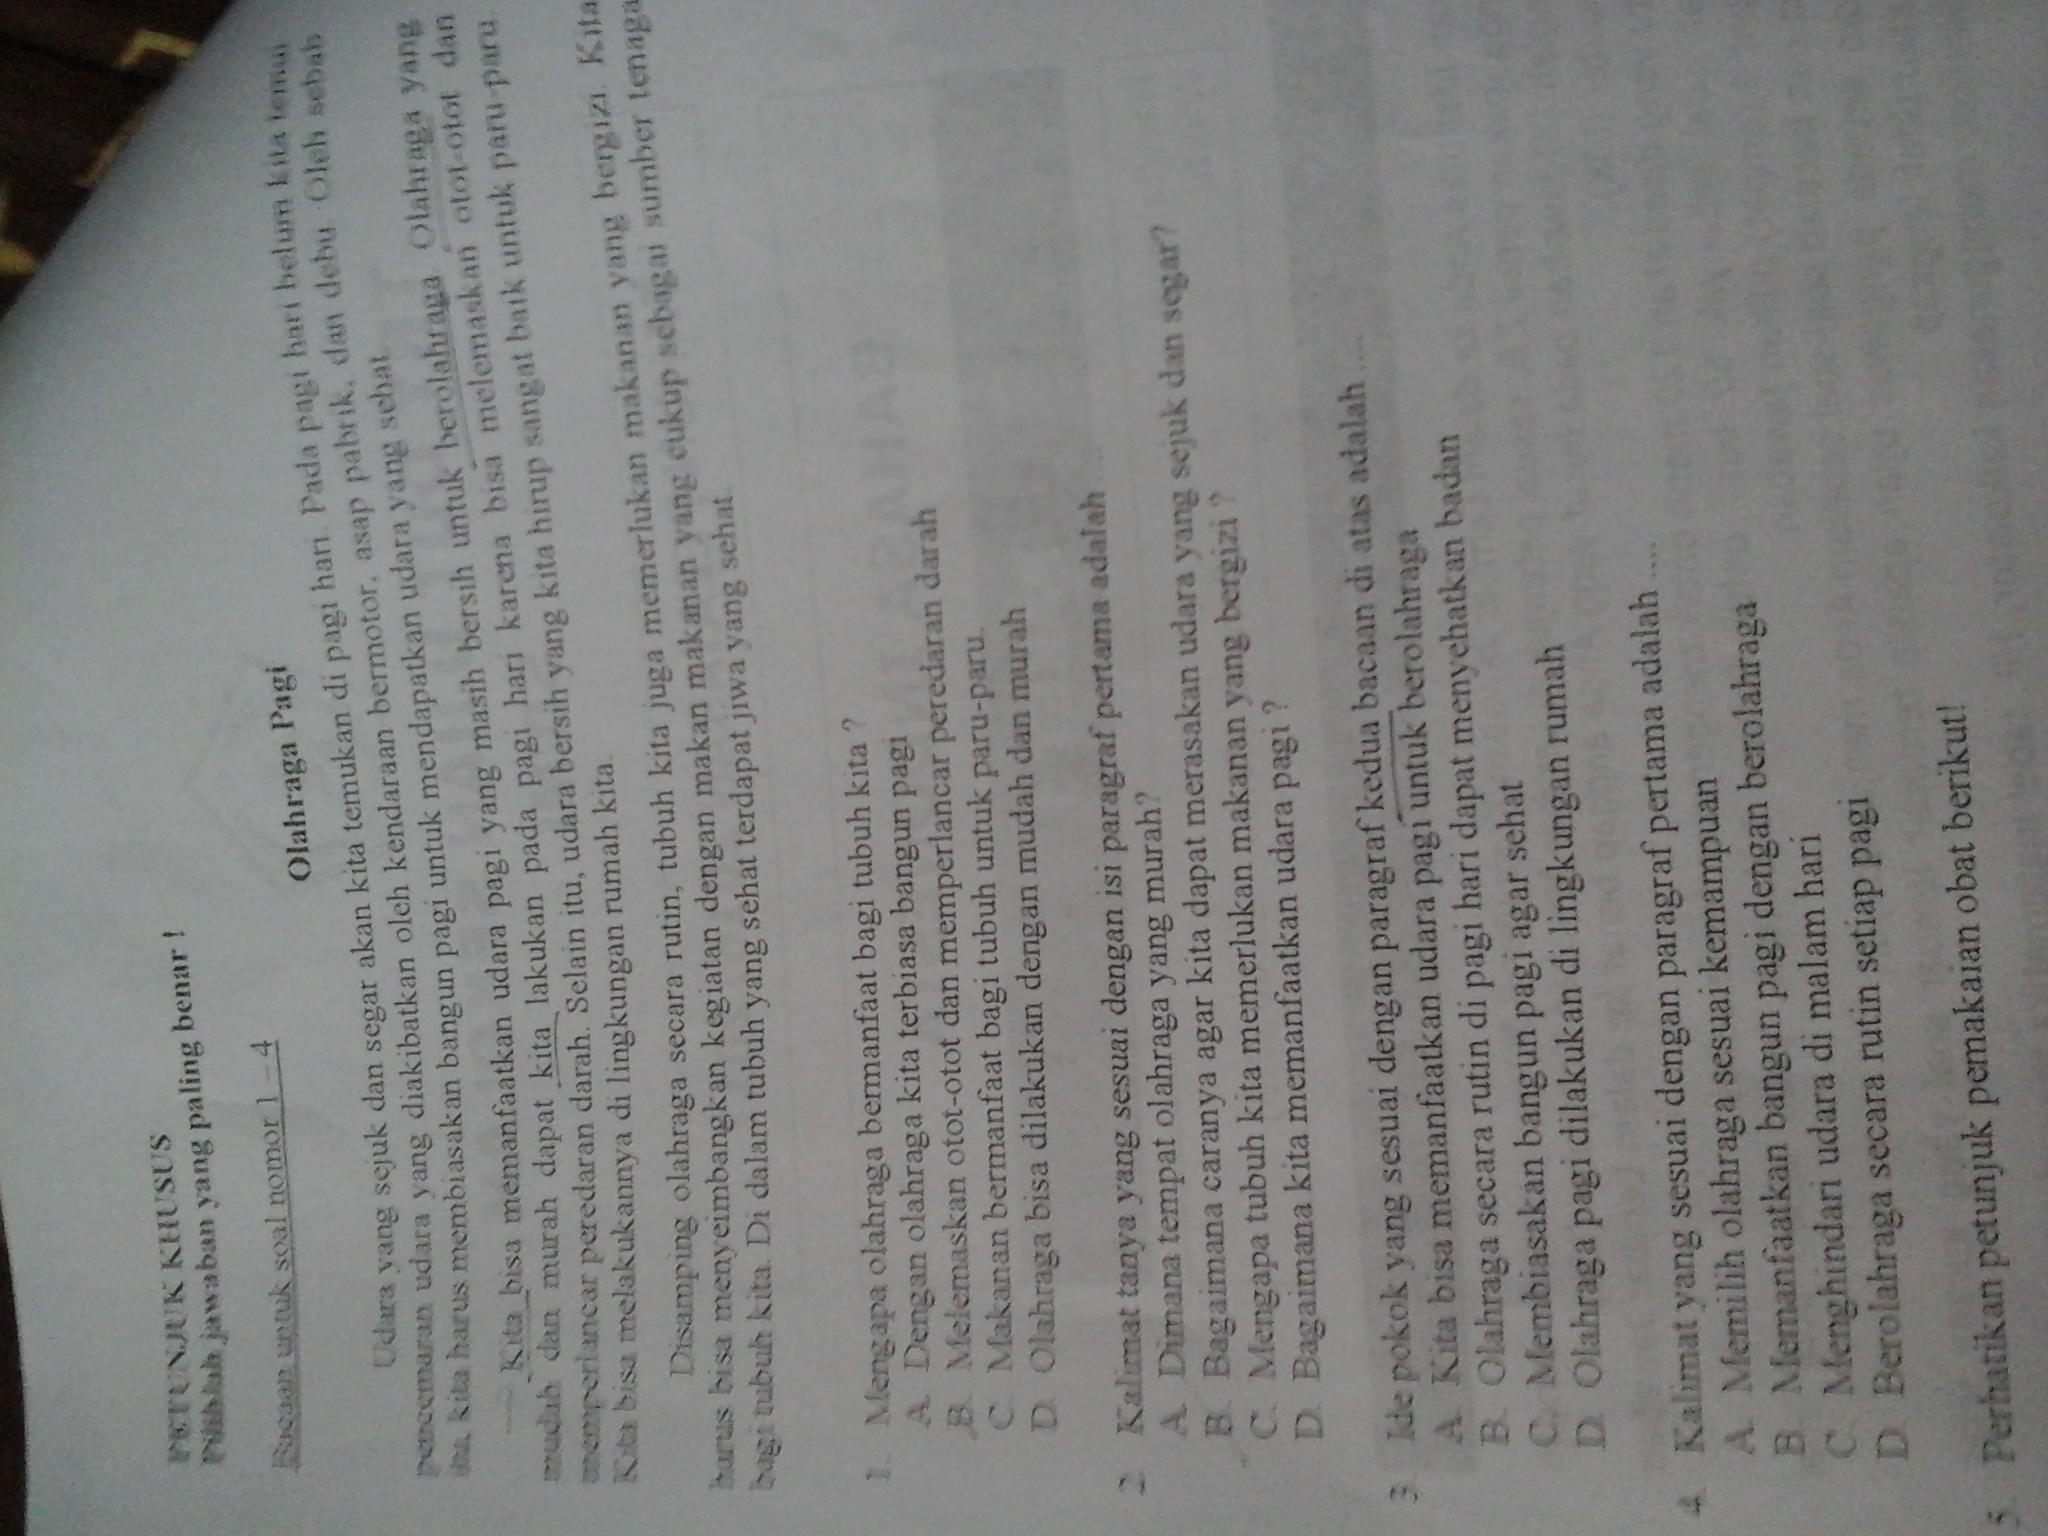 Tolong Jawab Nomor 3 Ya Brainly Co Id